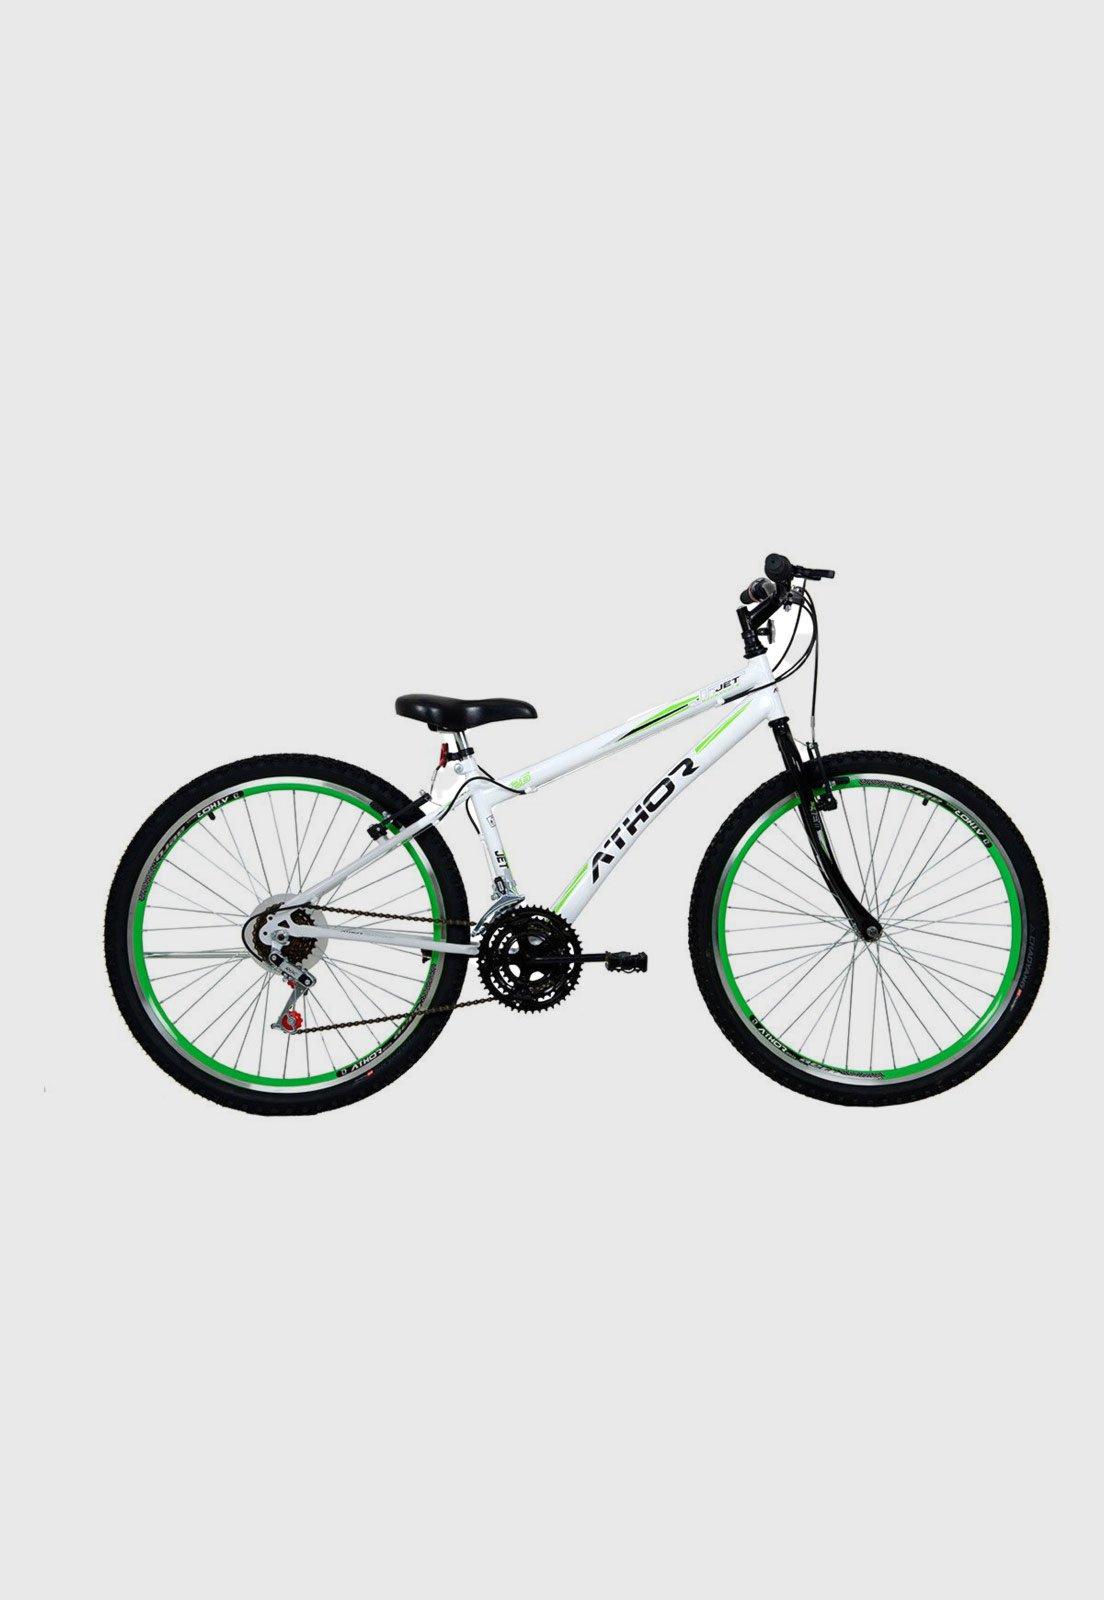 Bicicleta Athor Bike Jet Aro 26 Rígida 18 Marchas - Branco/verde